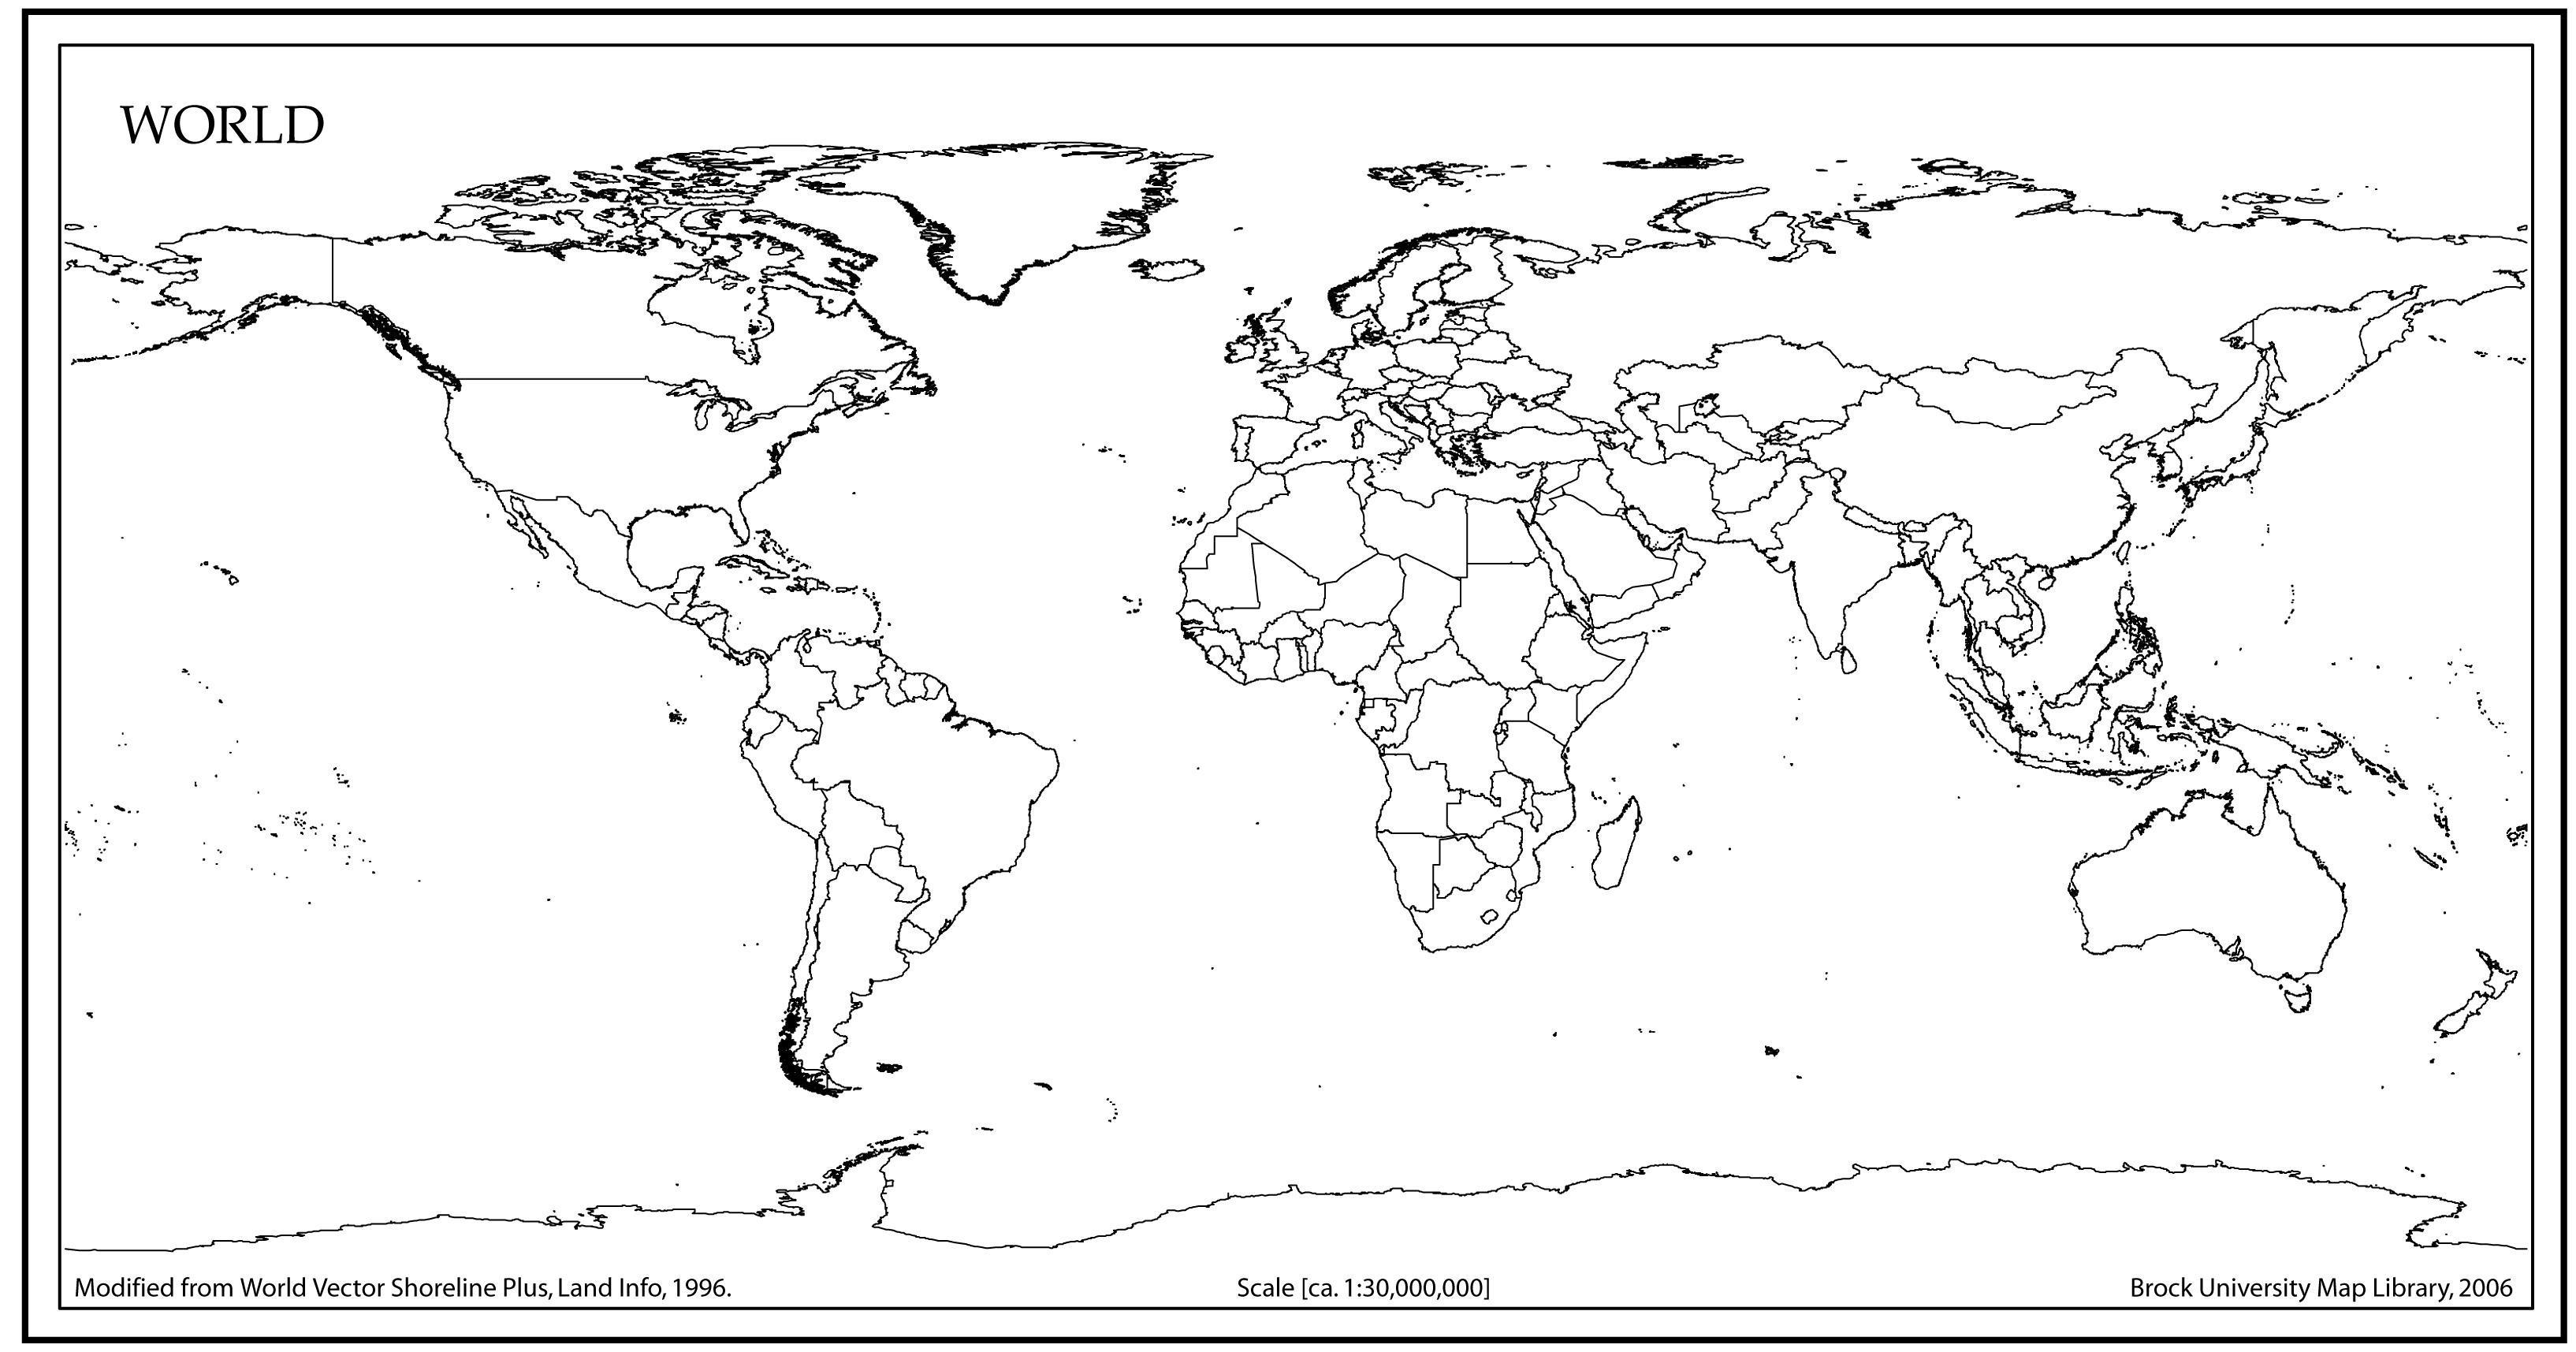 Printable World Map Large | Bestprintable231118 - Large Printable World Map